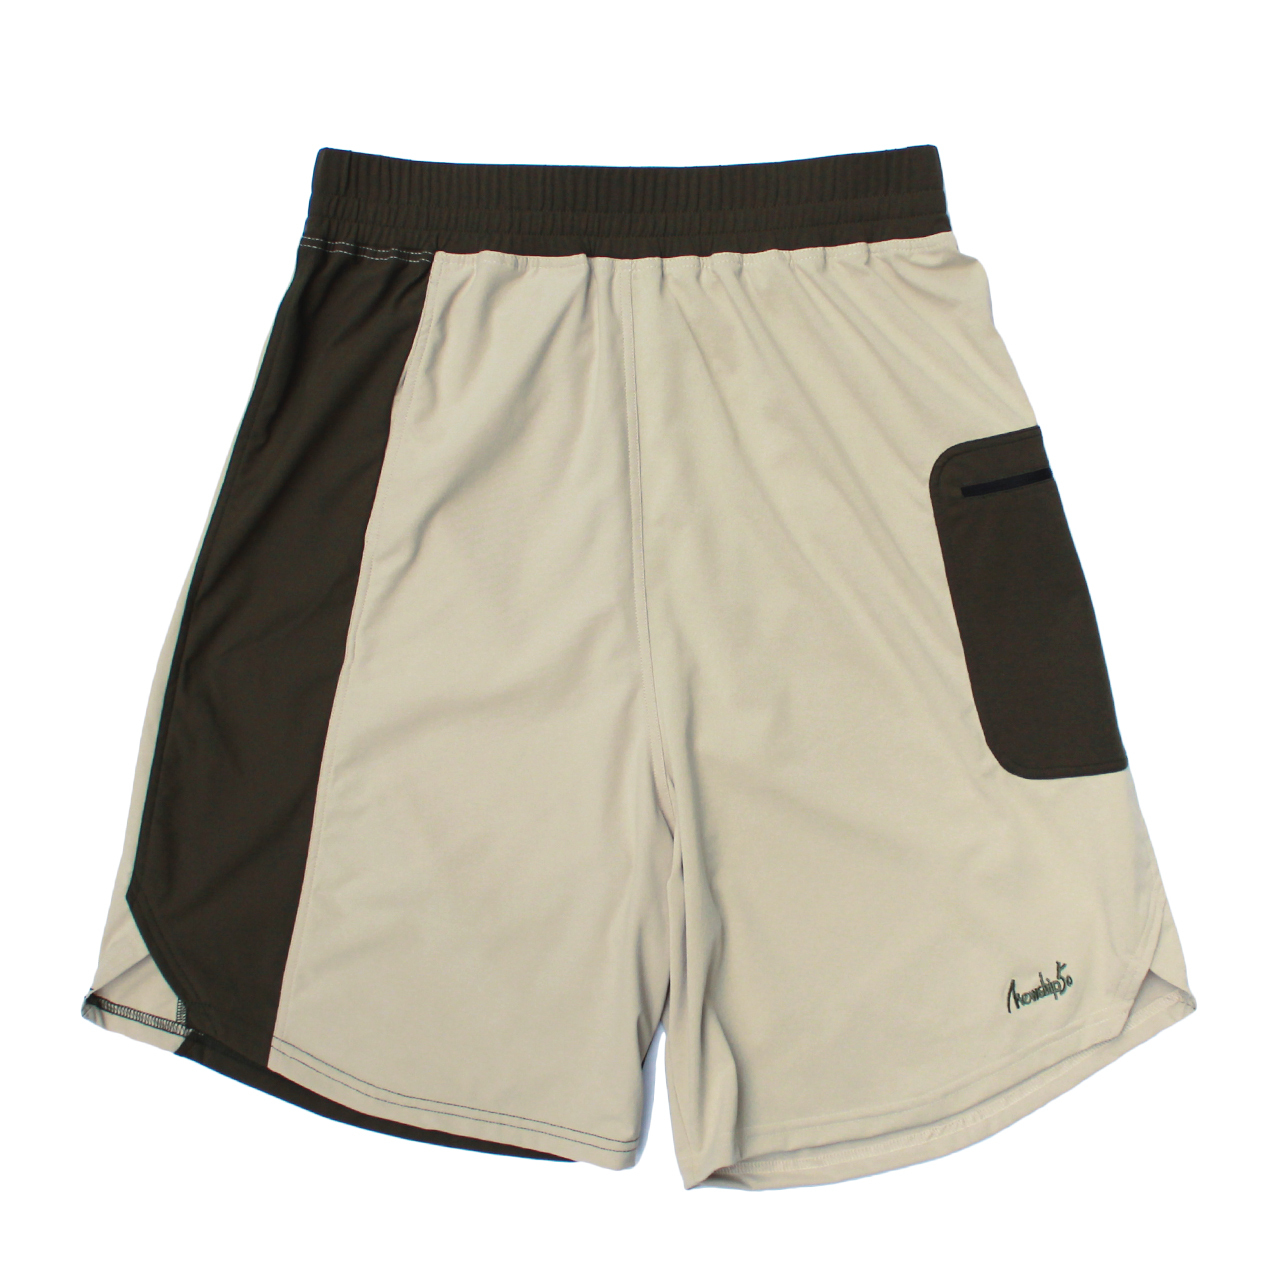 LOGO street shorts <Khaki×Beige>  - 画像1